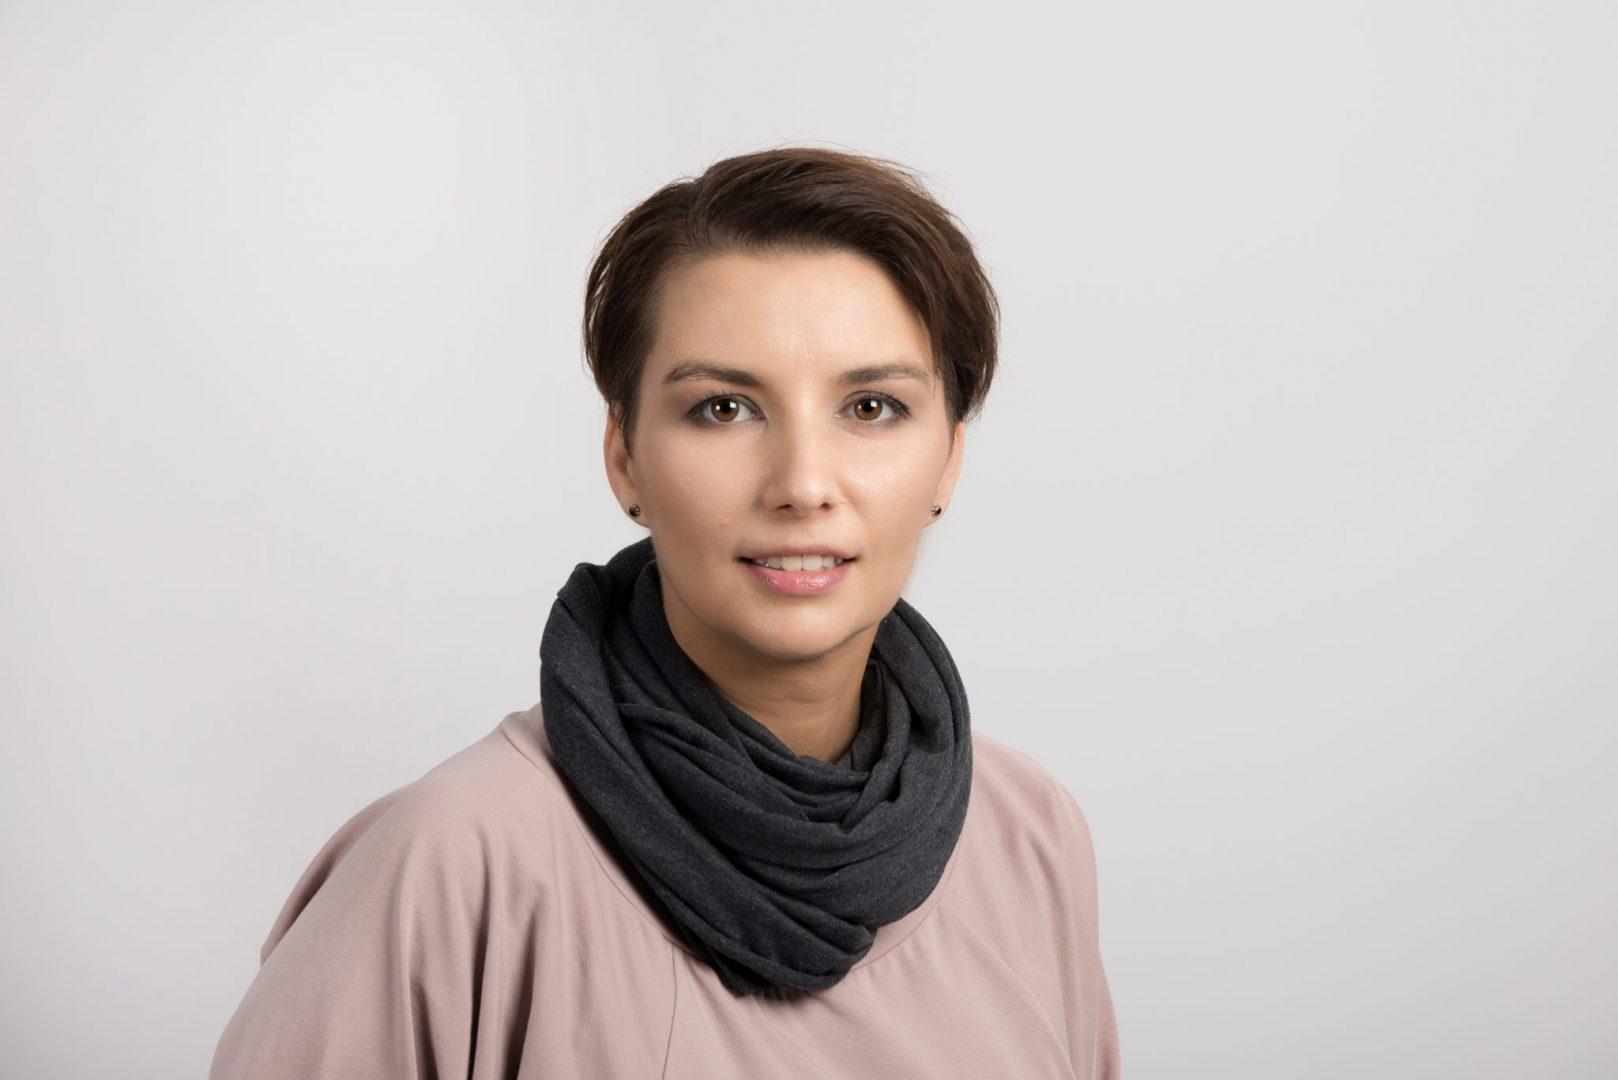 Agnieszka Baraniok-Lipińska